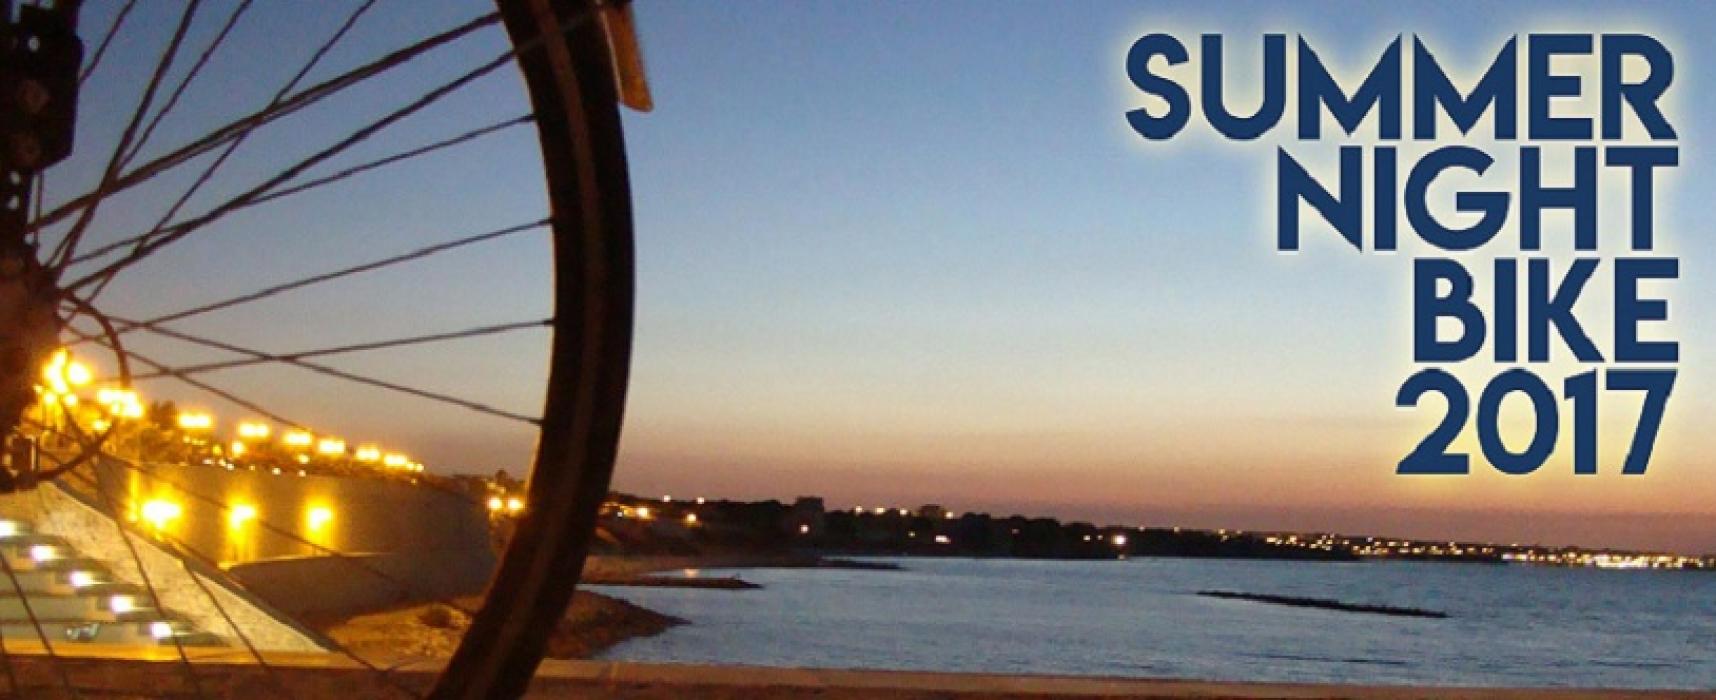 Summer night bike, domani sera l'ultima ciclopasseggiata targata Biciliæ